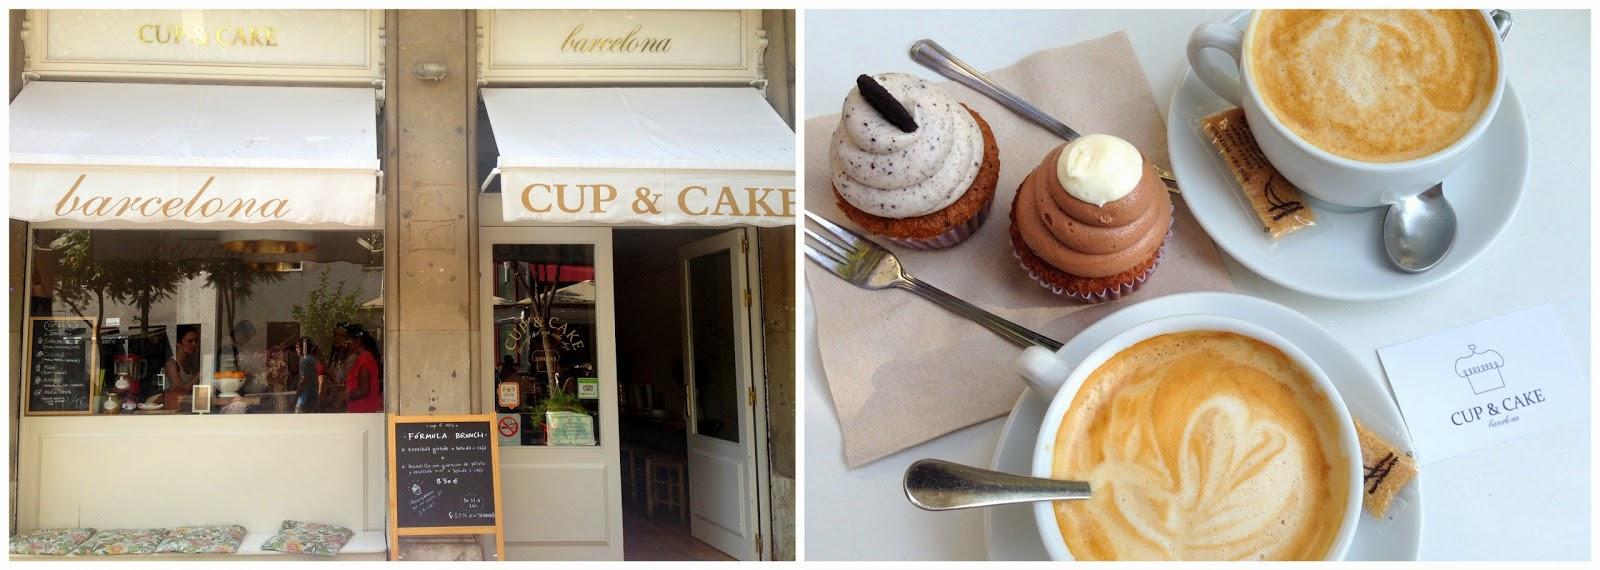 cup&cake barcelona desayuno dulce cafe